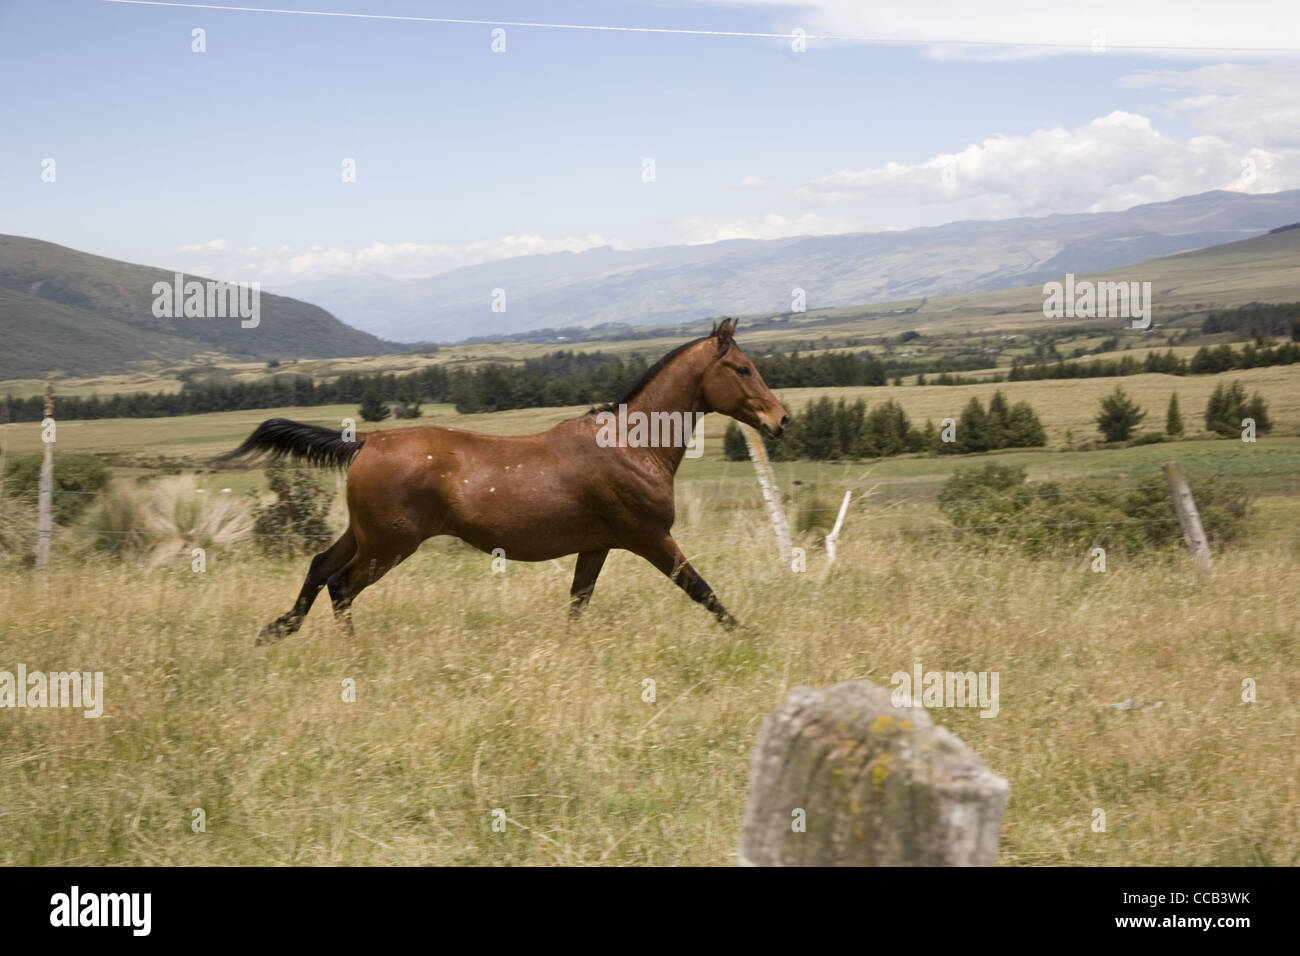 Ecuador Cotopaxi El Porvenir Hacienda criollo Pferd Stockbild